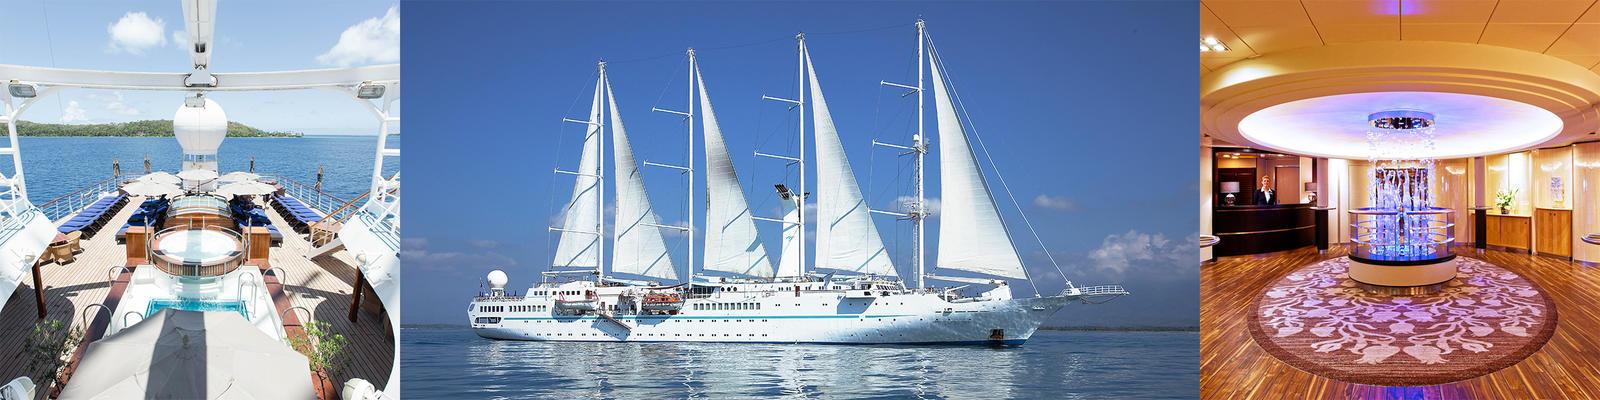 Windstar Wind Spirit Cruise Ship Review Photos Departure Ports - Wind spirit